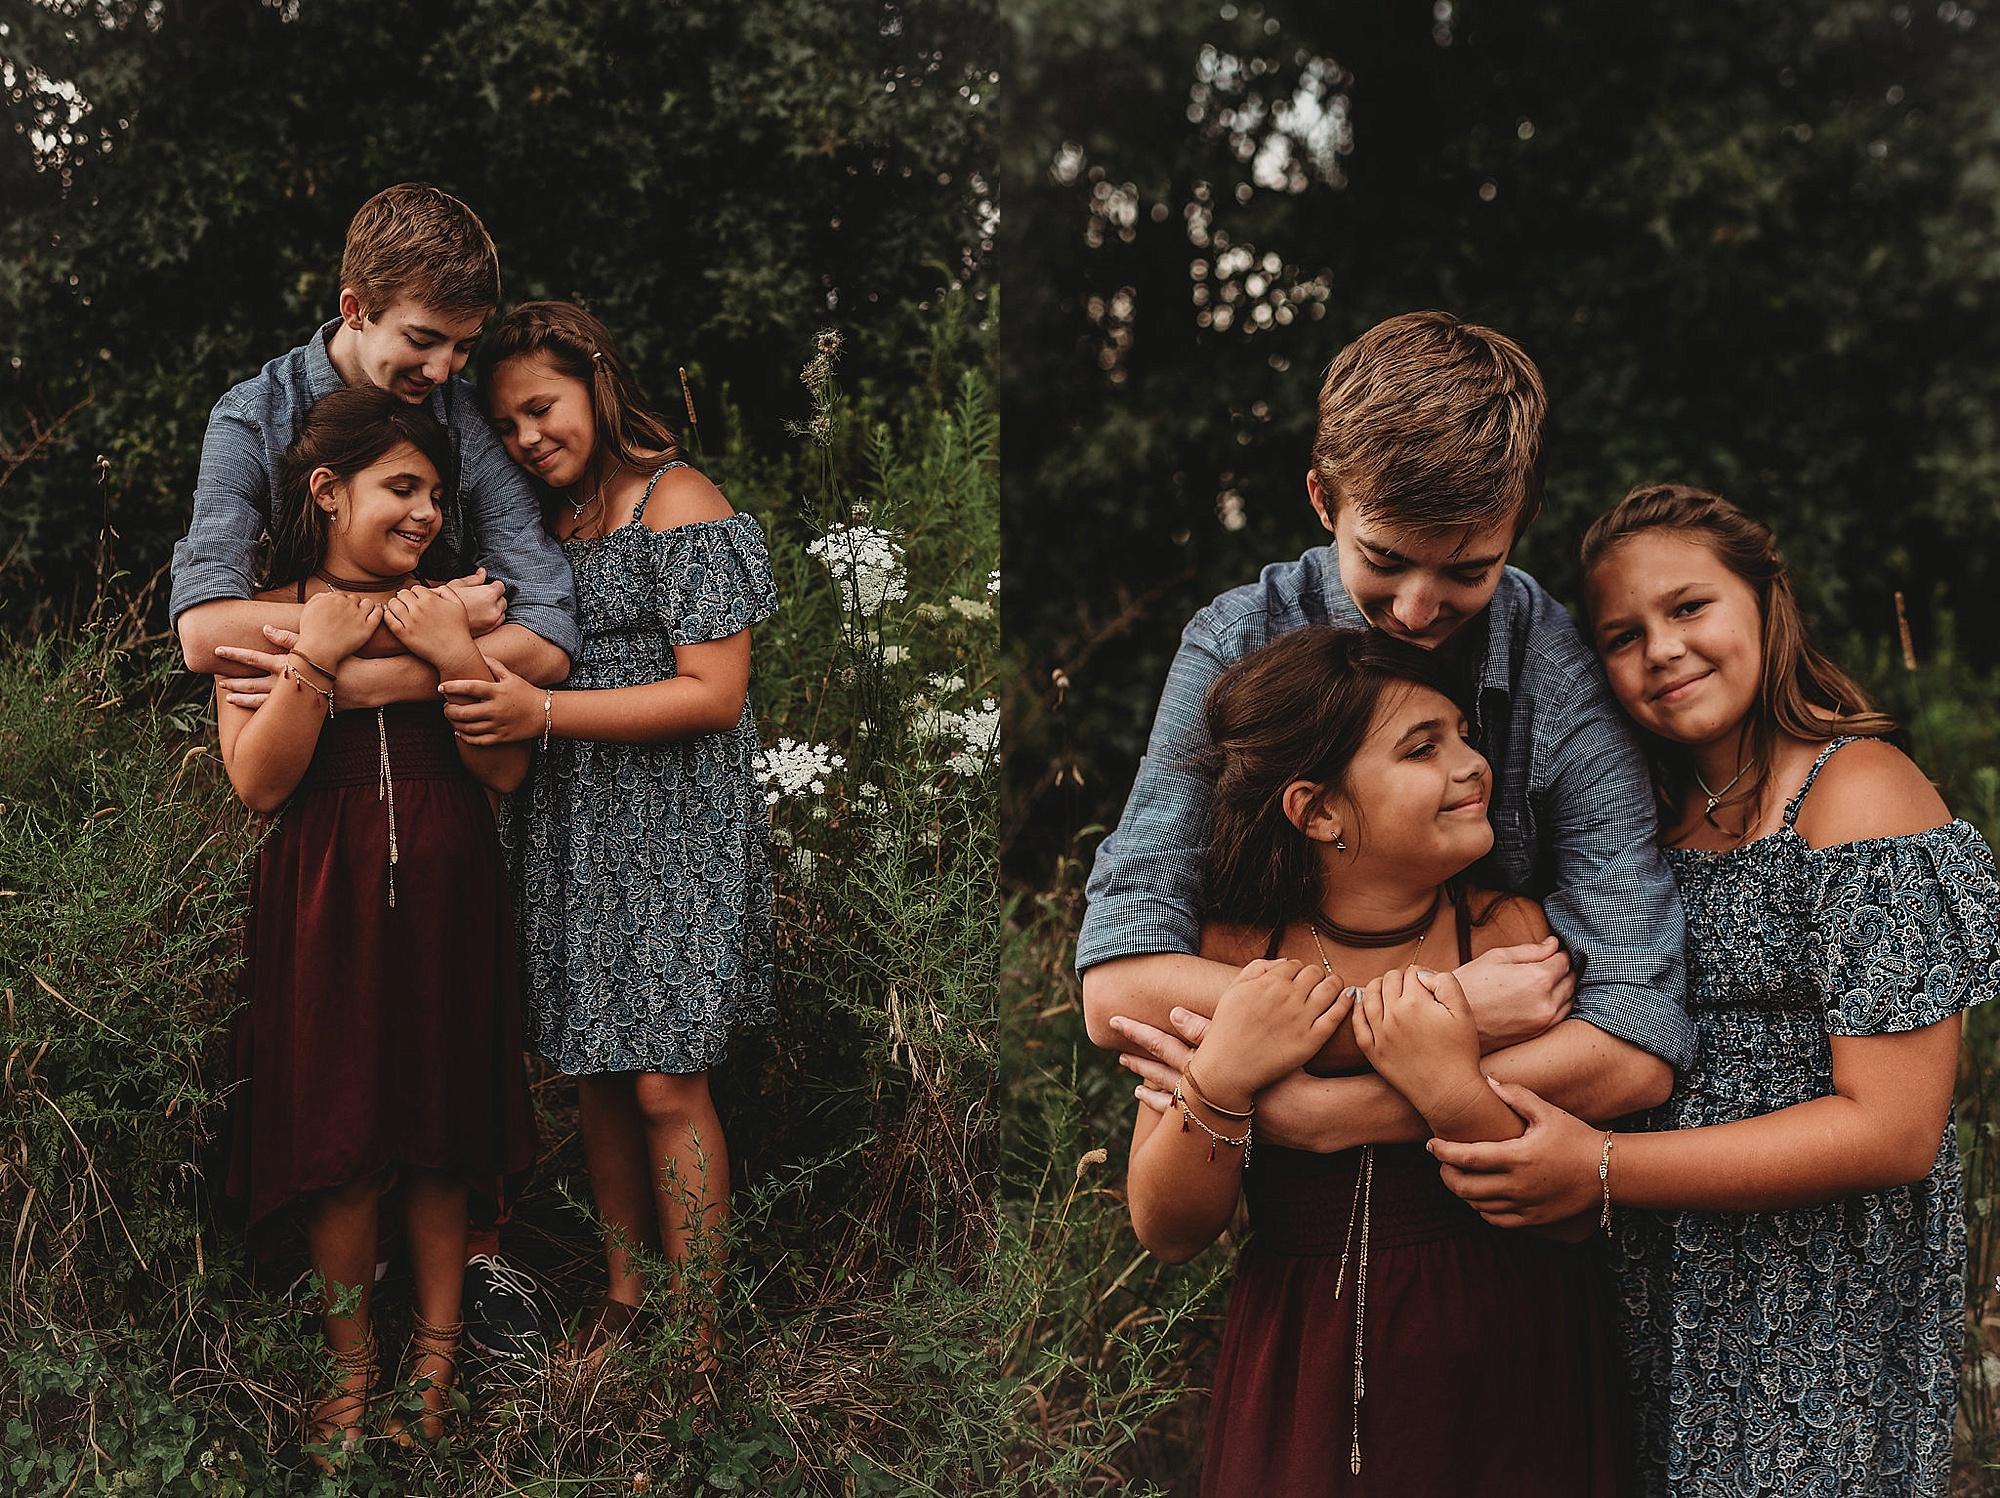 mcfredrick-family-lauren-grayson-akron-ohio_0011.jpg